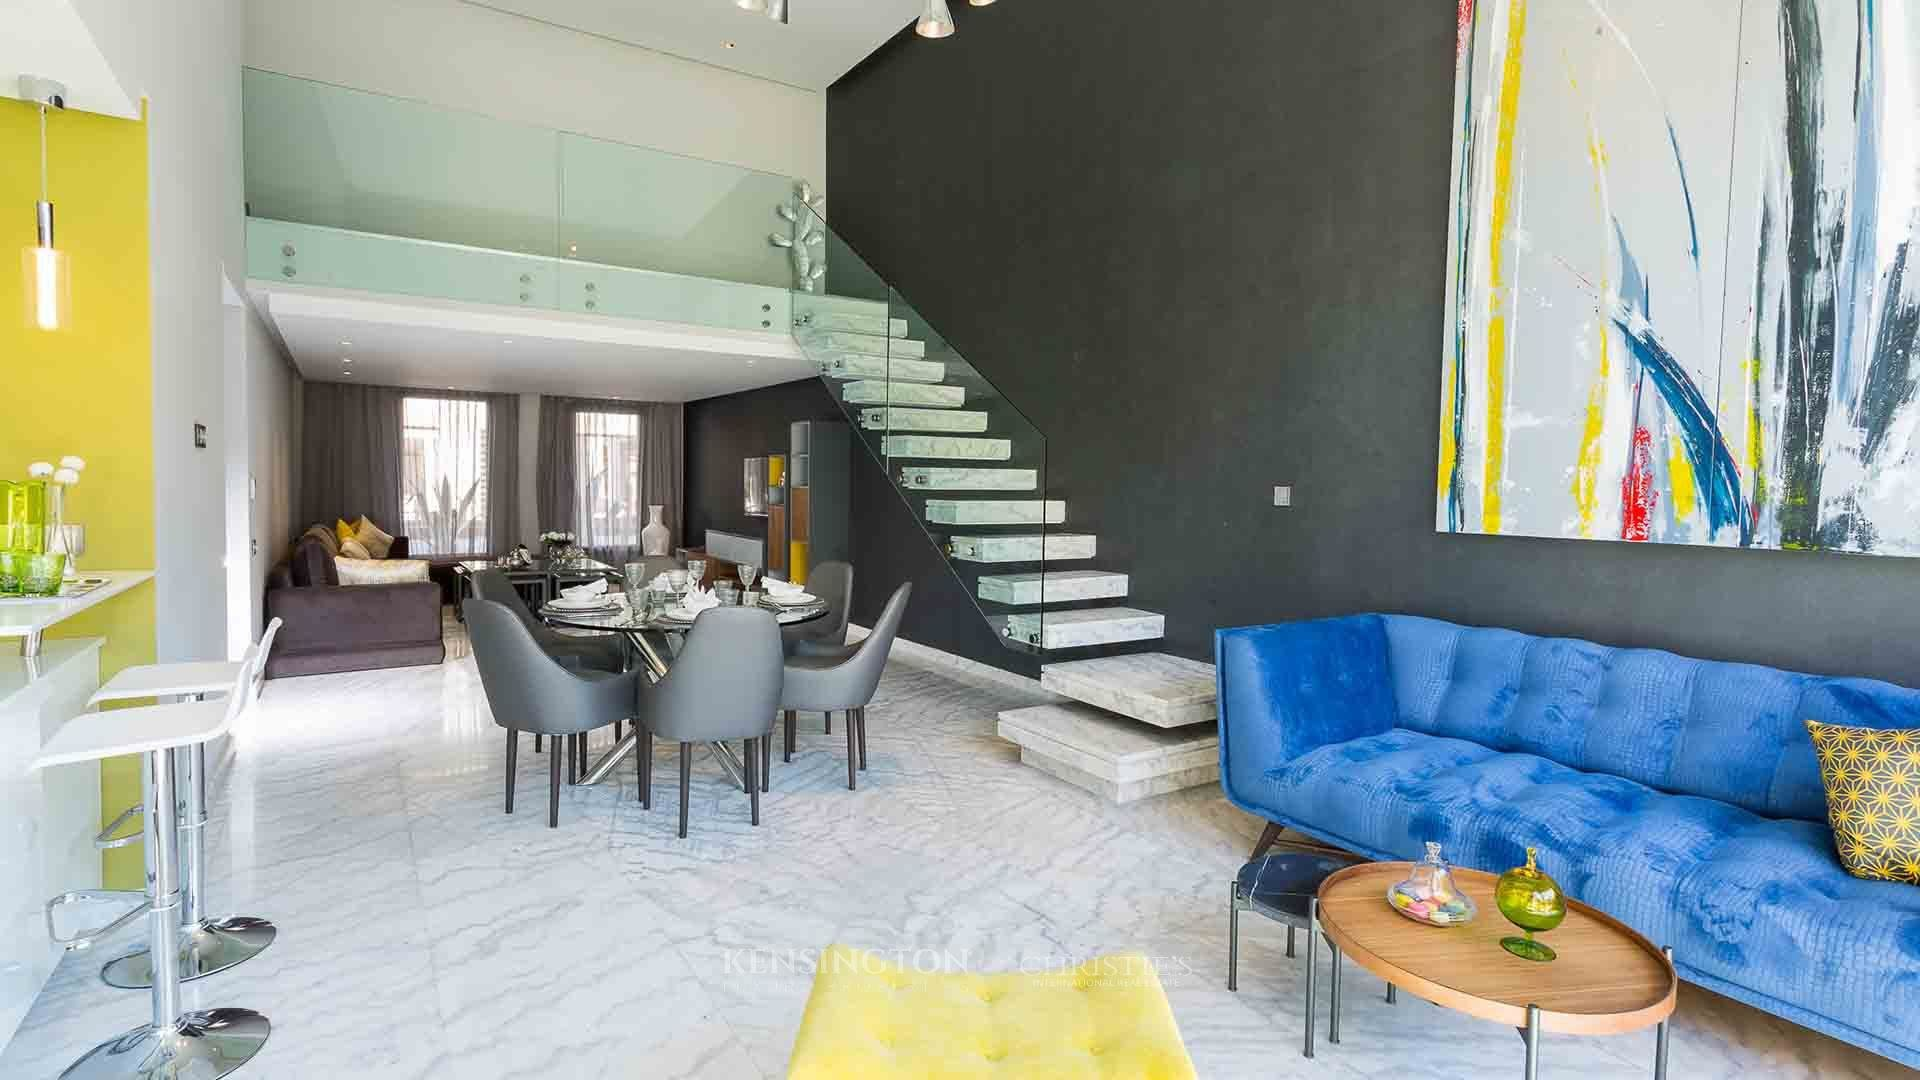 KPPM01087: Loft Oliver Appartement Marrakech Maroc